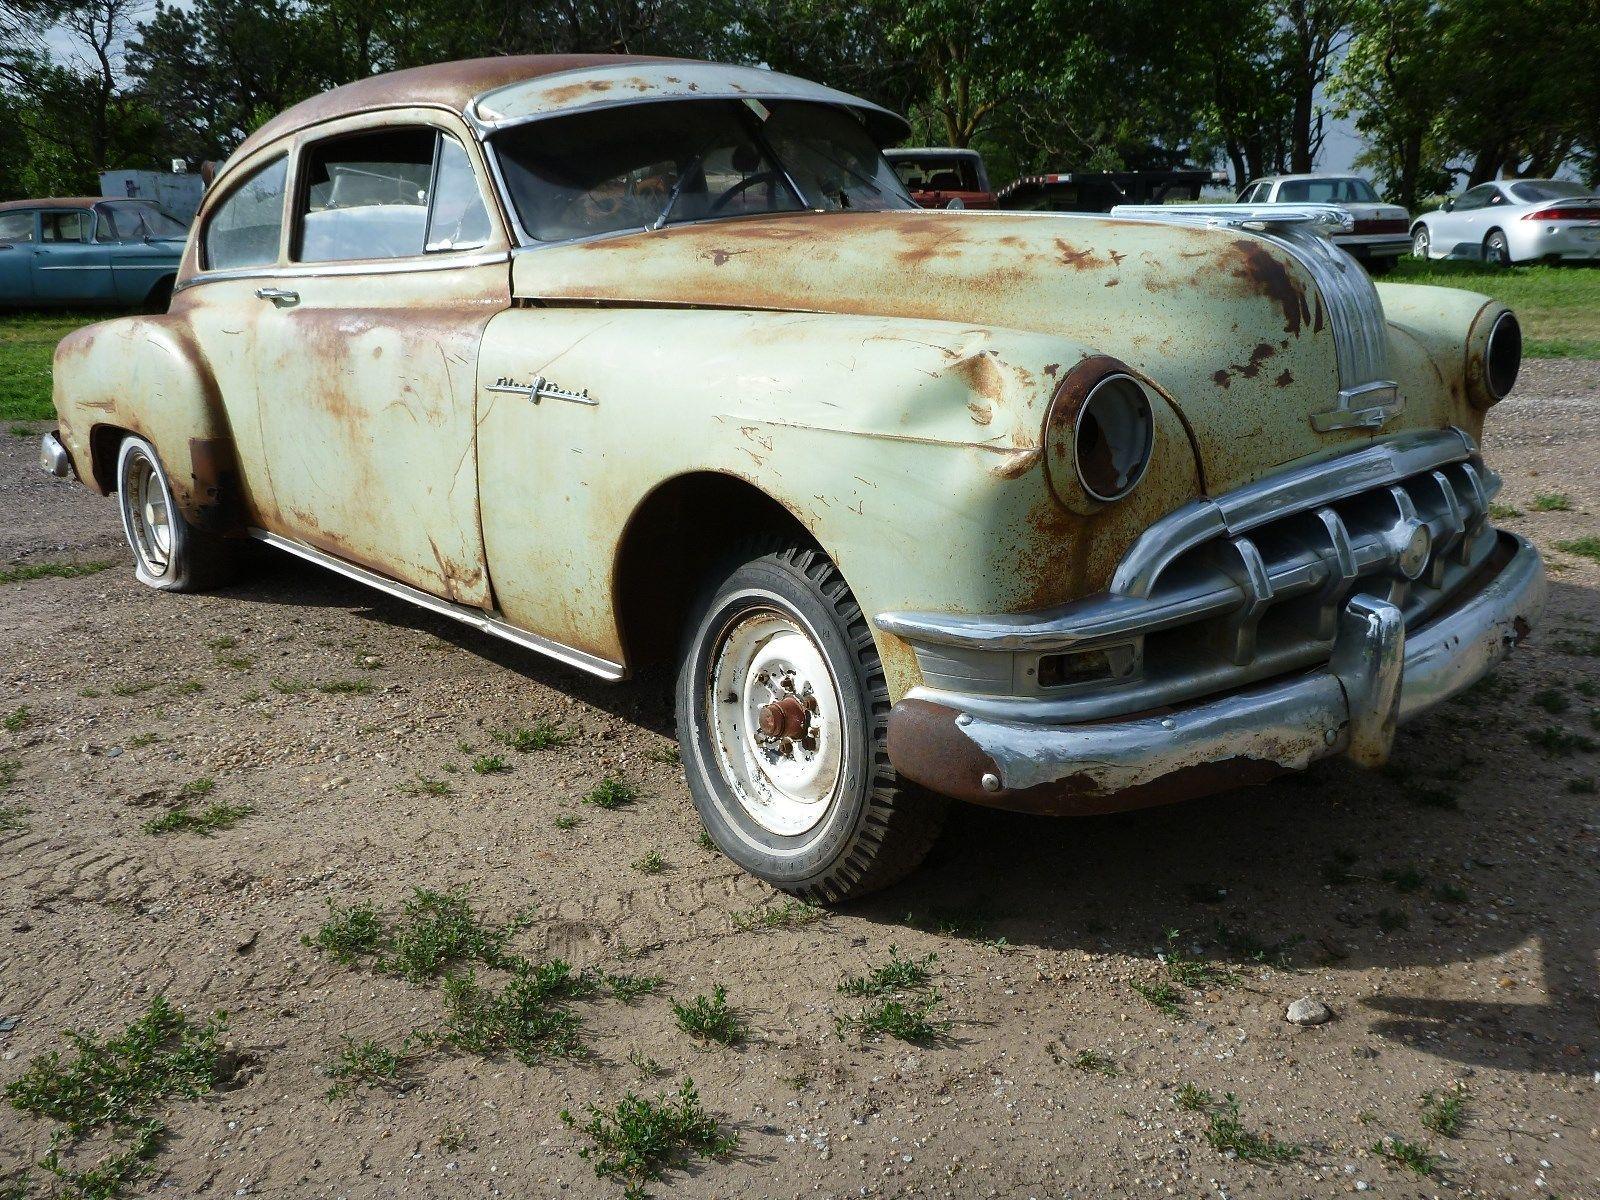 1950 Pontiac Silver Streak Hot Rod Wiring Diagrams 1941 2 Door Rat Project Parts Car Gas Rh Pinterest Com 1947